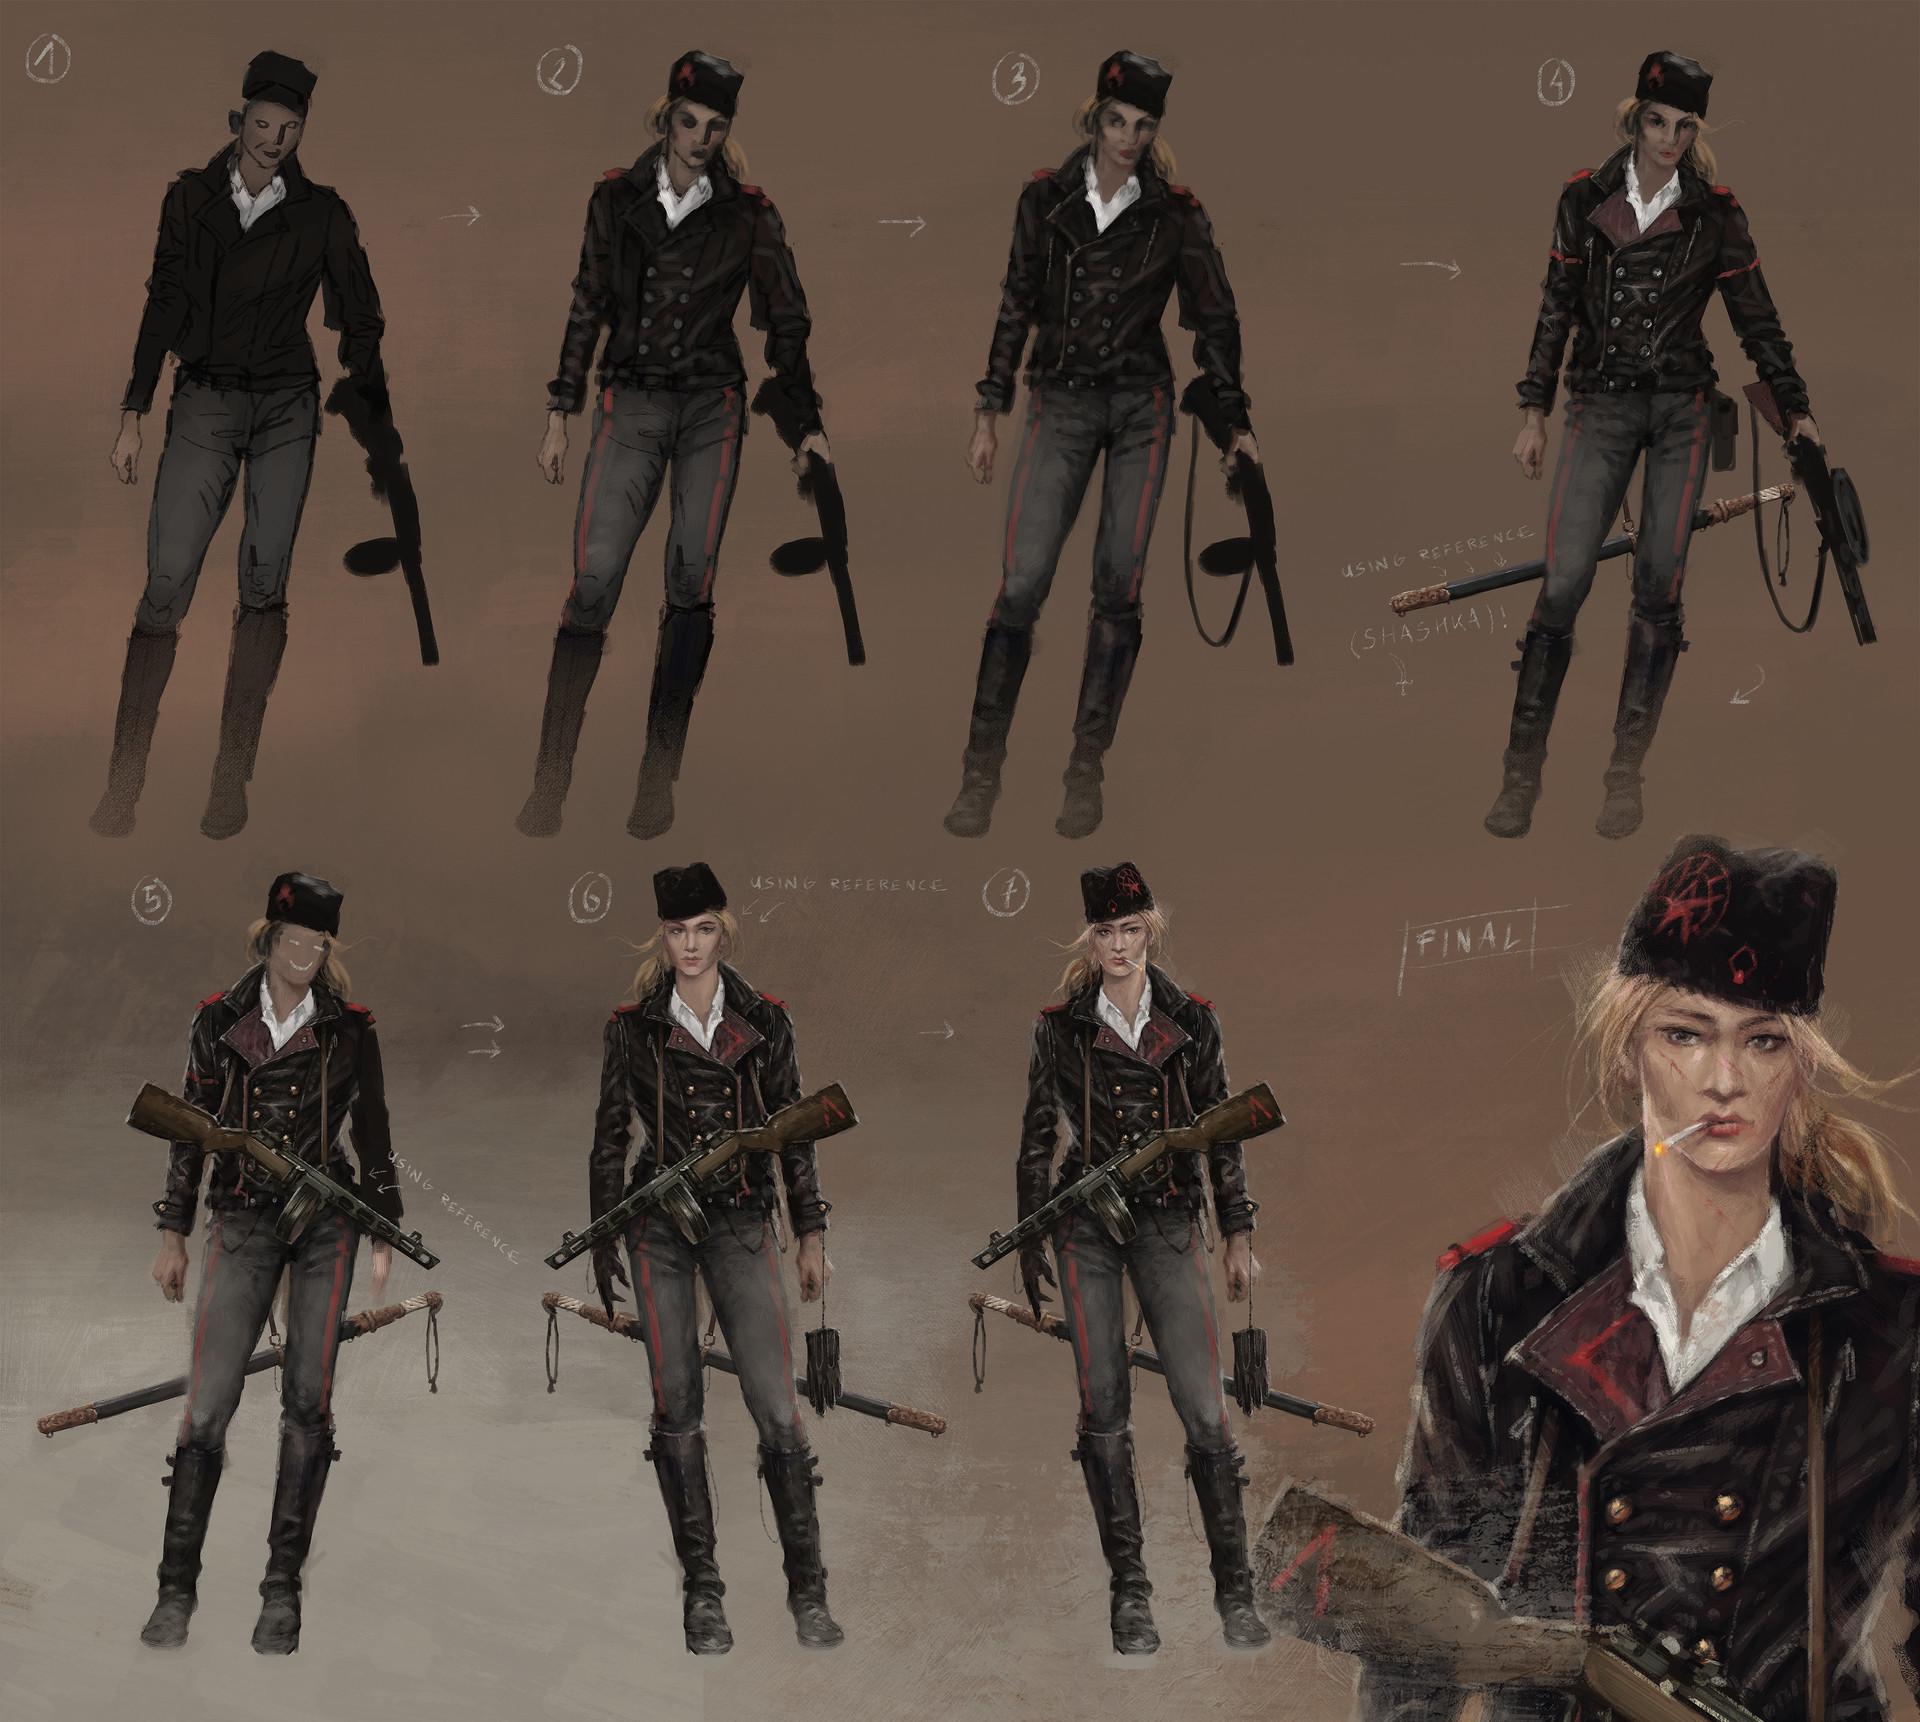 Jakub rozalski olga concept art01s1process